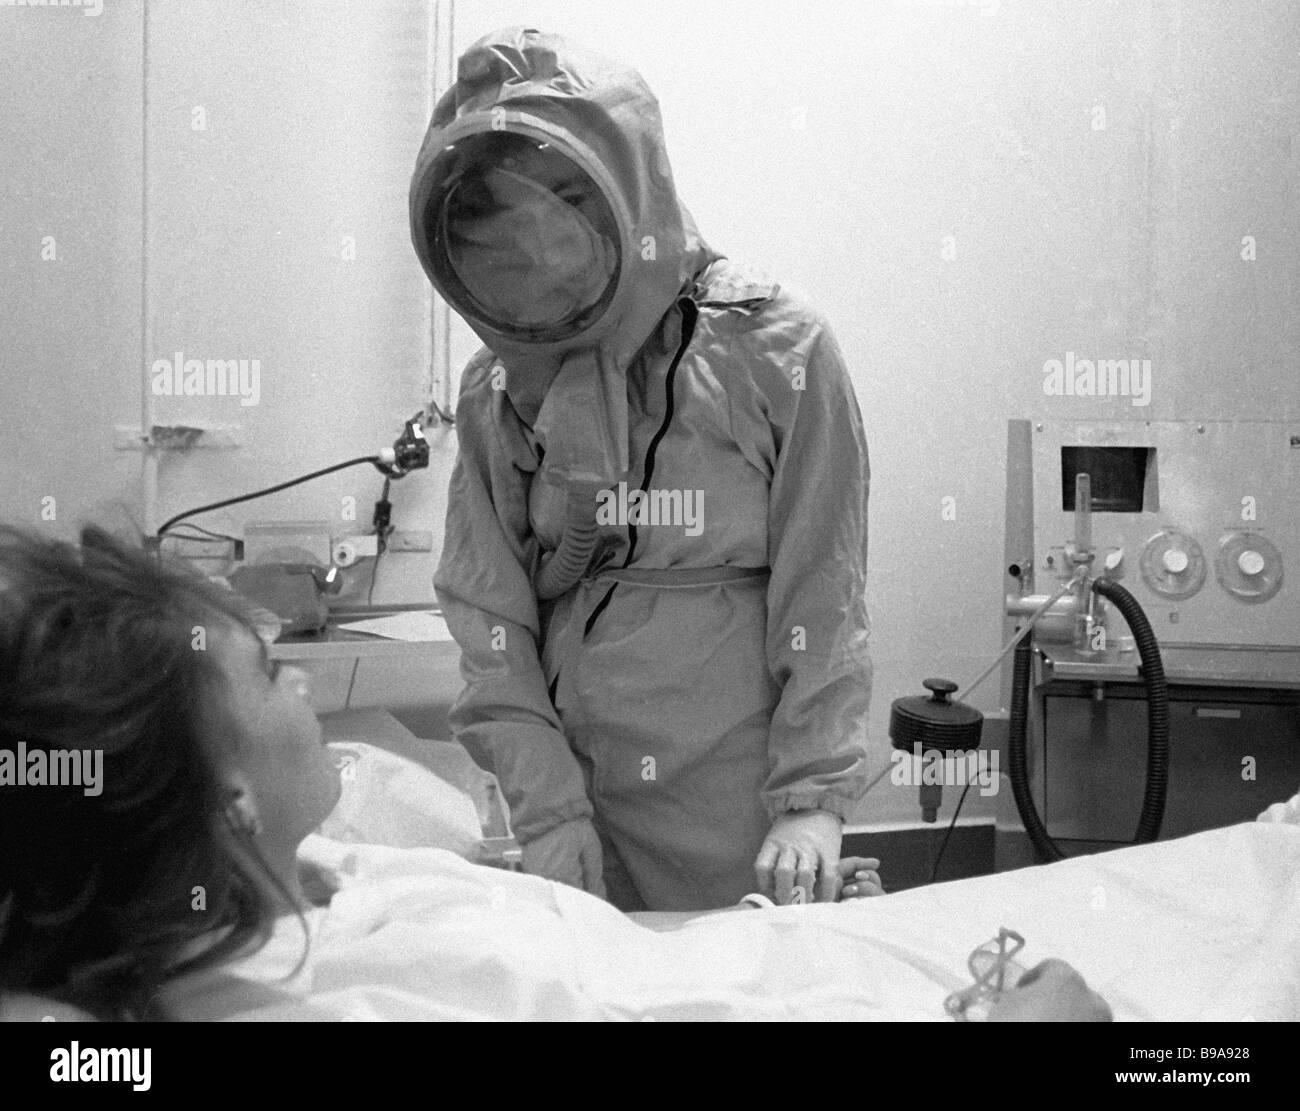 Ethik der Krankenschwestern, die Patienten datieren